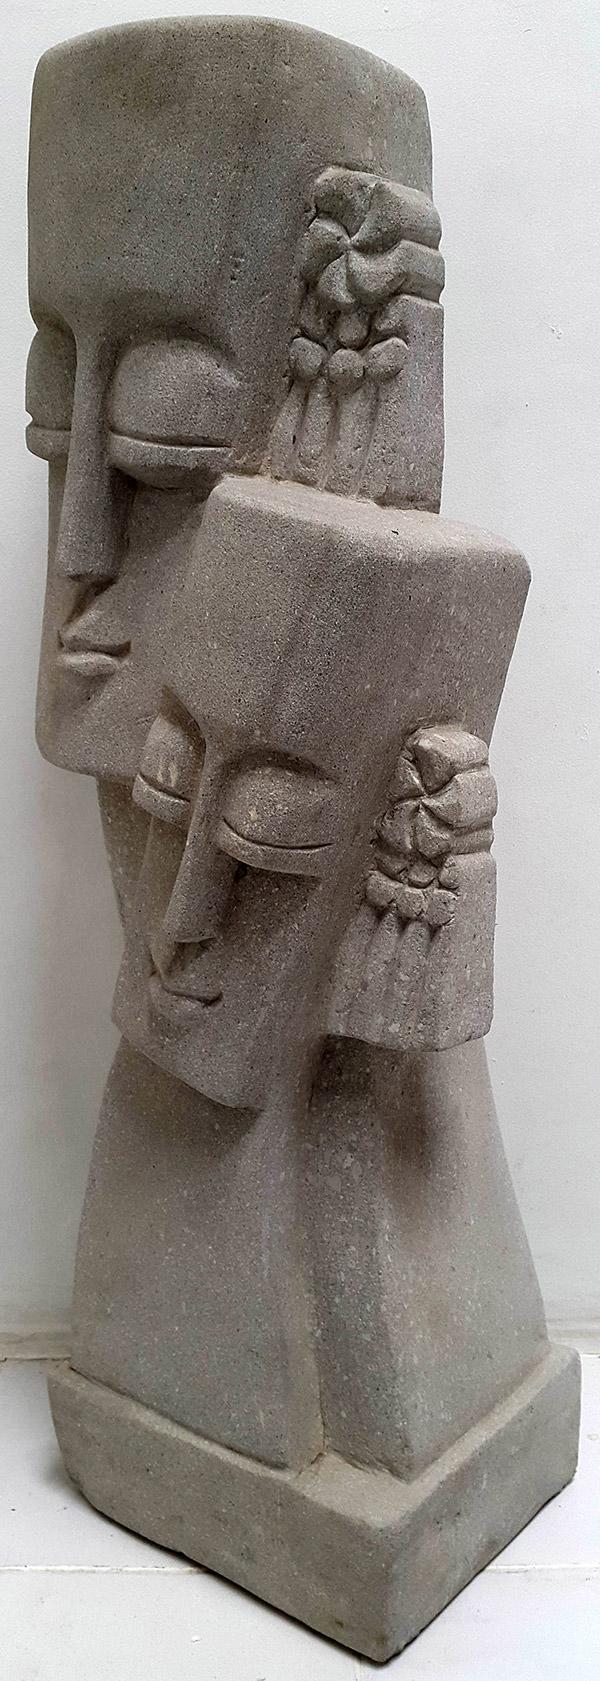 primitive stone sculpture